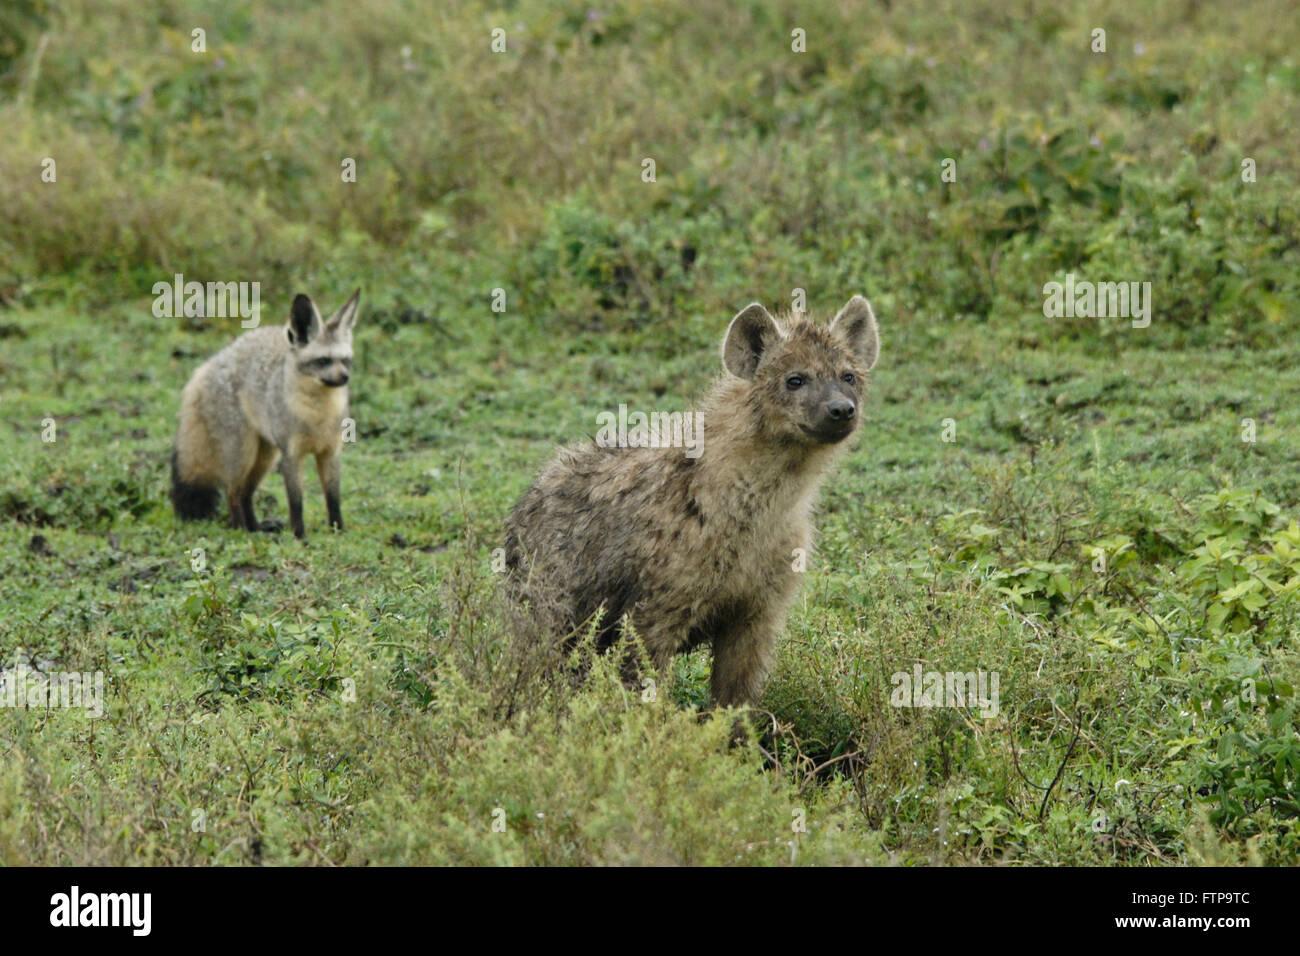 Bat-eared fox wary of curious young spotted hyena, Ngorongoro Conservation Area (Ndutu), Tanzania Stock Photo